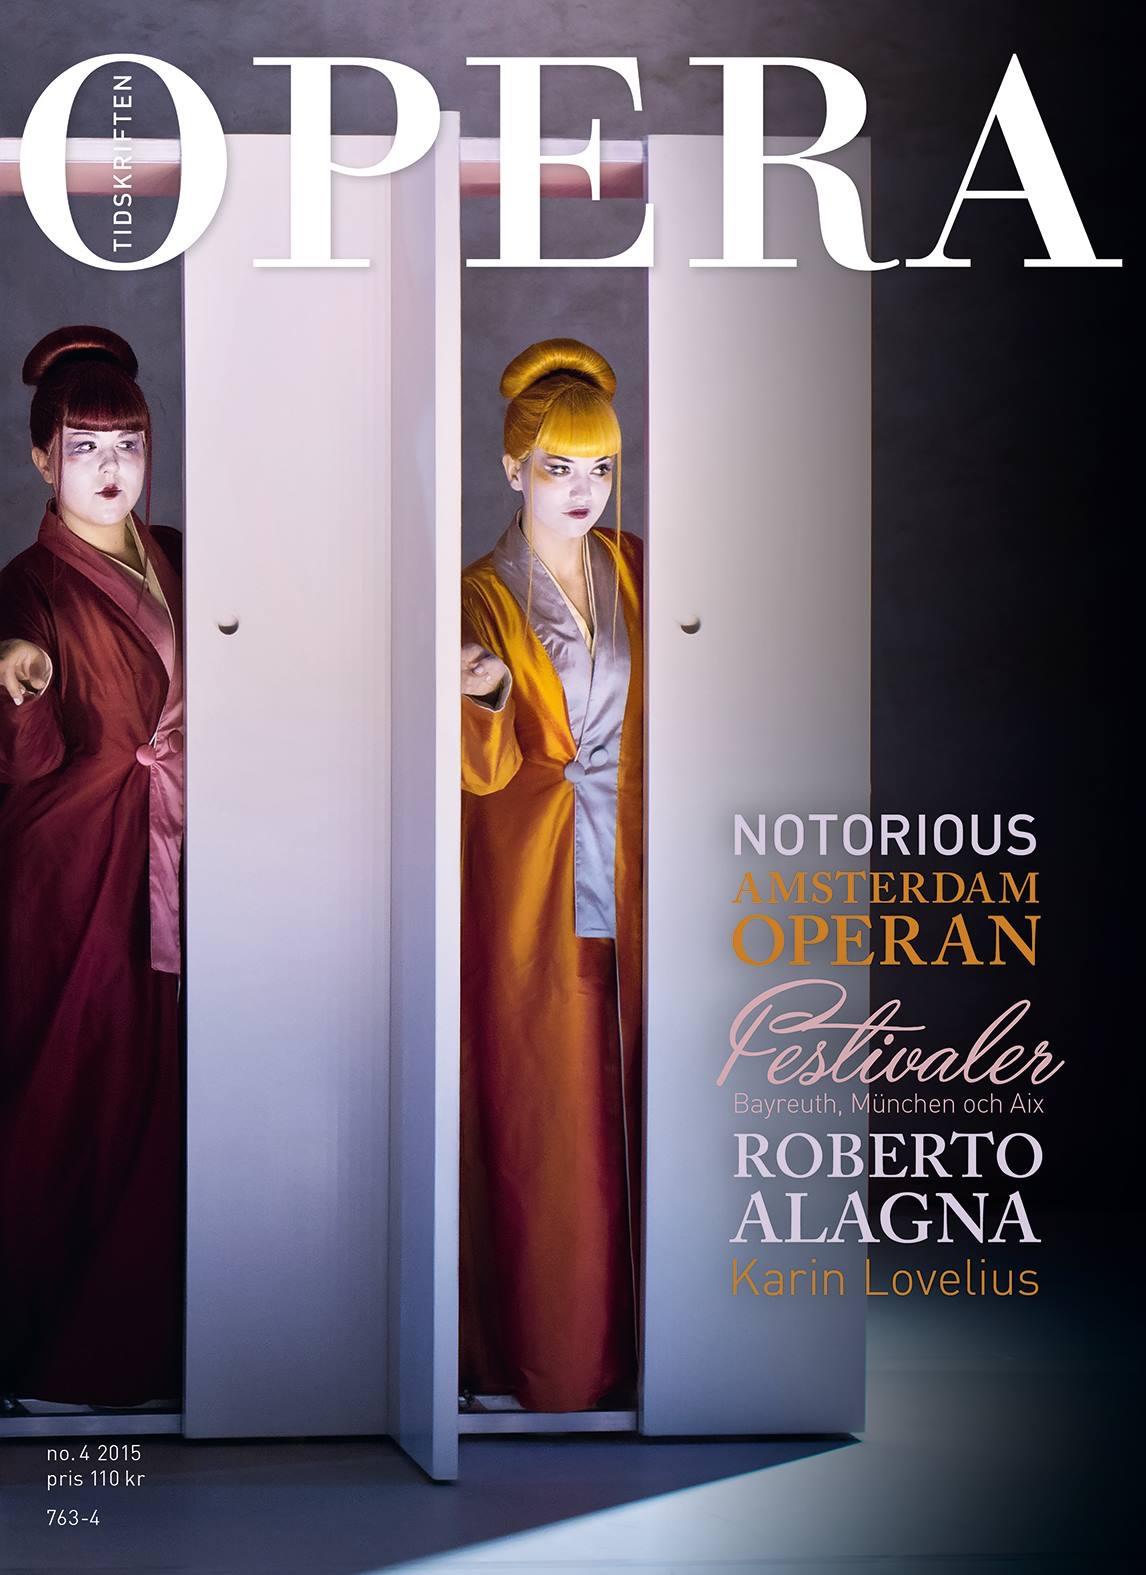 Cover of Sweden's opera magazine  Tidskriften   September 2015   Photo by Markus Gårder